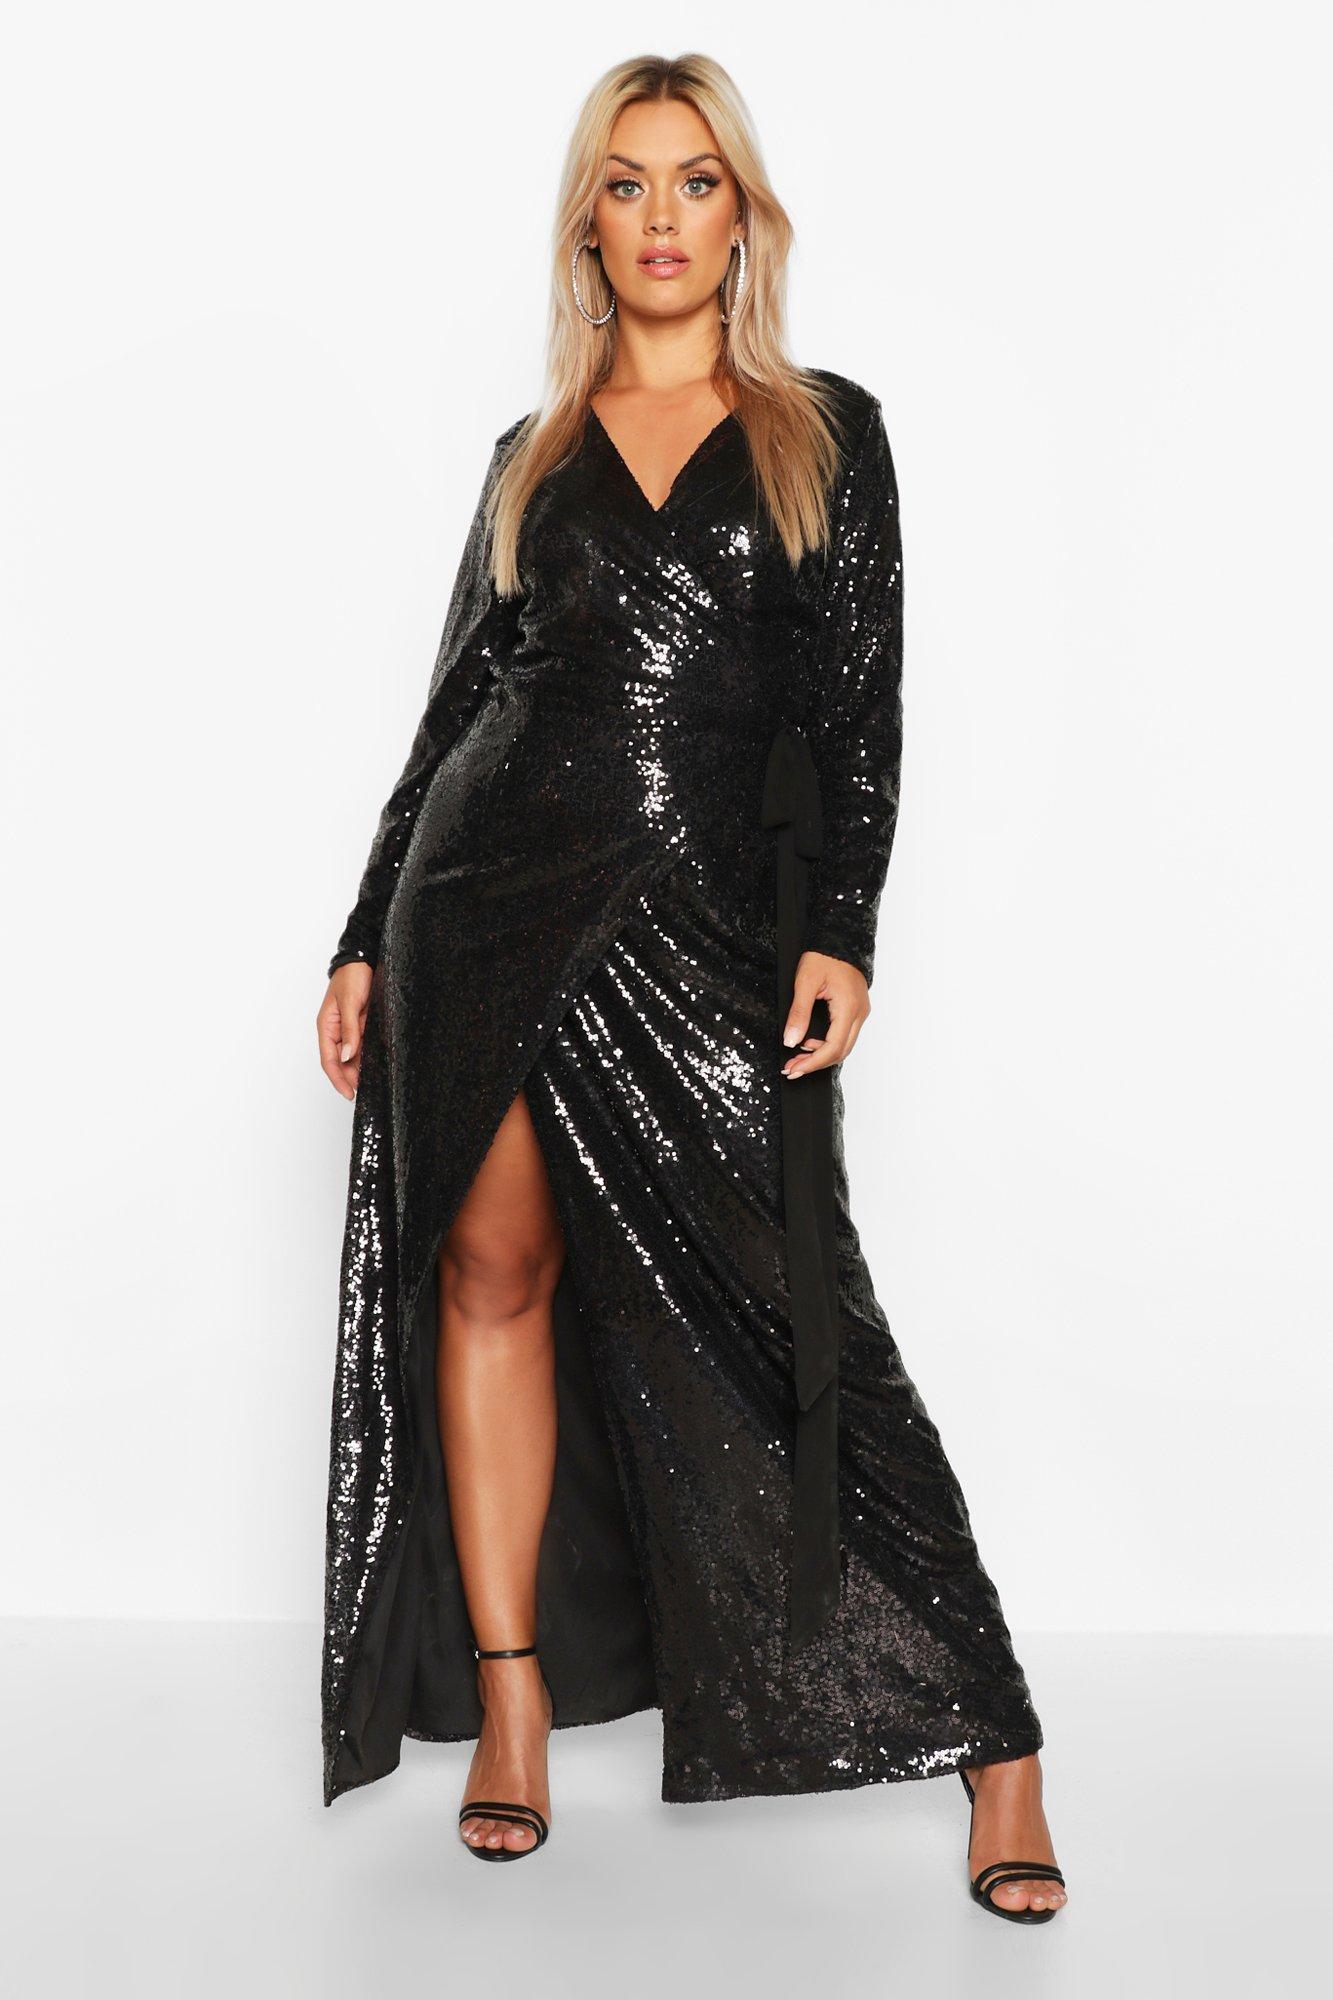 Plus Size Retro Dresses 50s, 60s ,70s, 80s, 90s Womens Plus Sequin Wrap Floor Sweeping Maxi Dress - Metallics - 16 $28.80 AT vintagedancer.com